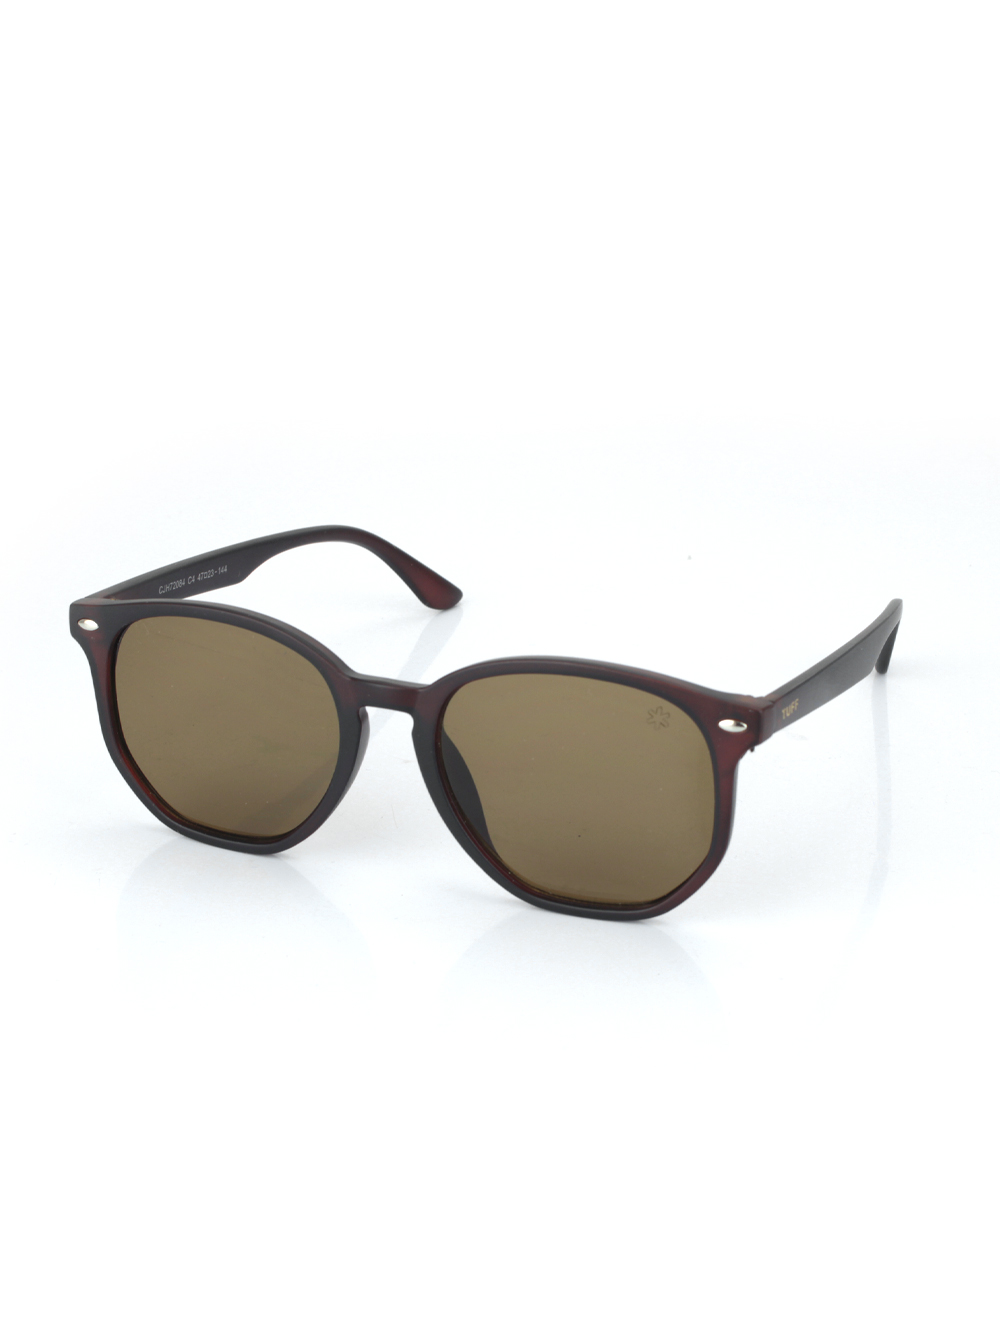 Sunglasses Hexagonal Marrom